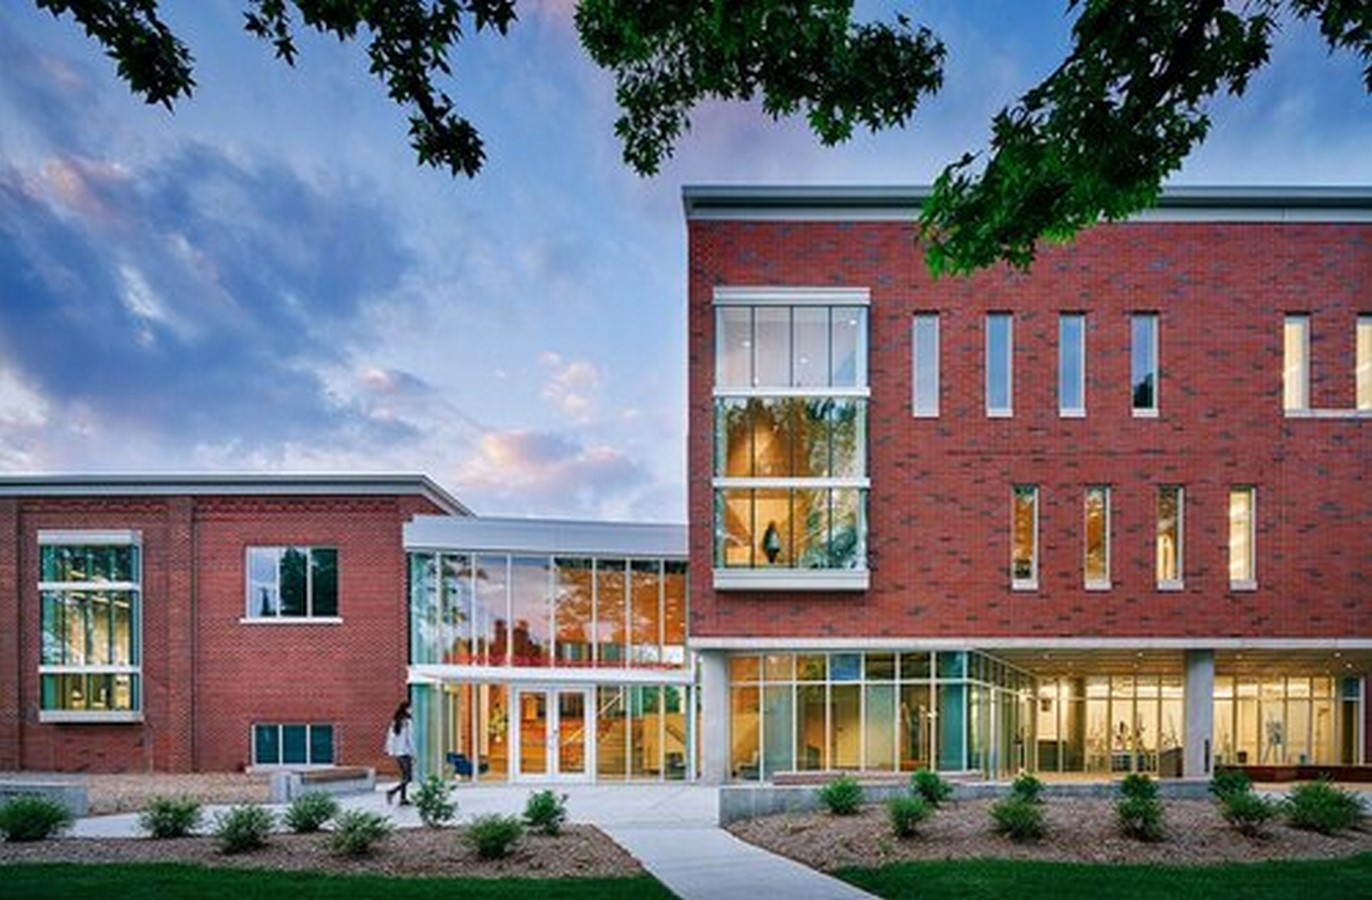 Architects in Kansas city - Top 90 Architects in Kansas city - Sheet22